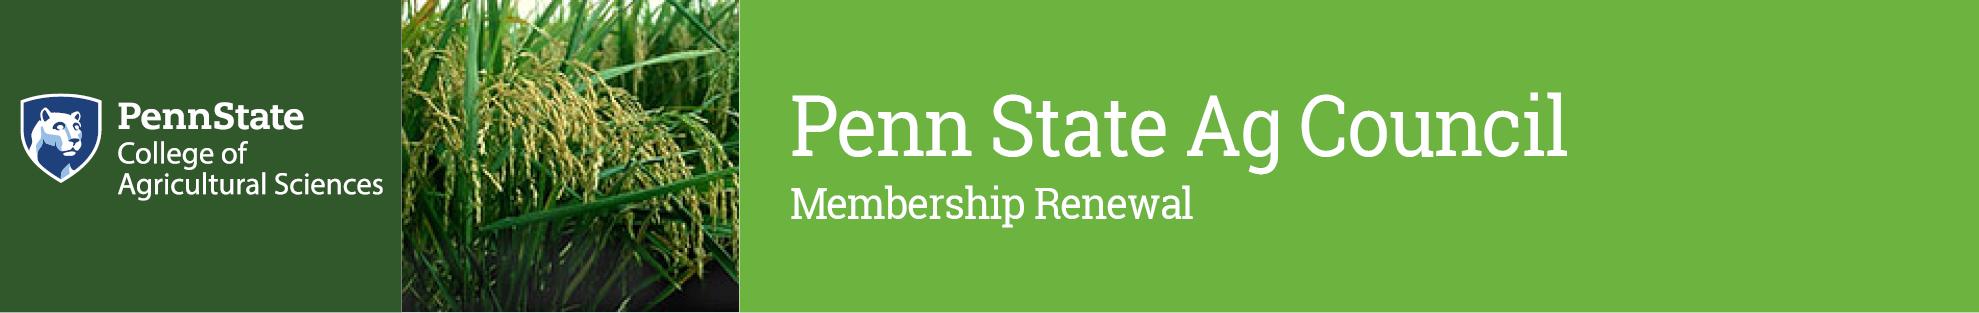 Penn State Ag Council - 2017 Membership Renewal